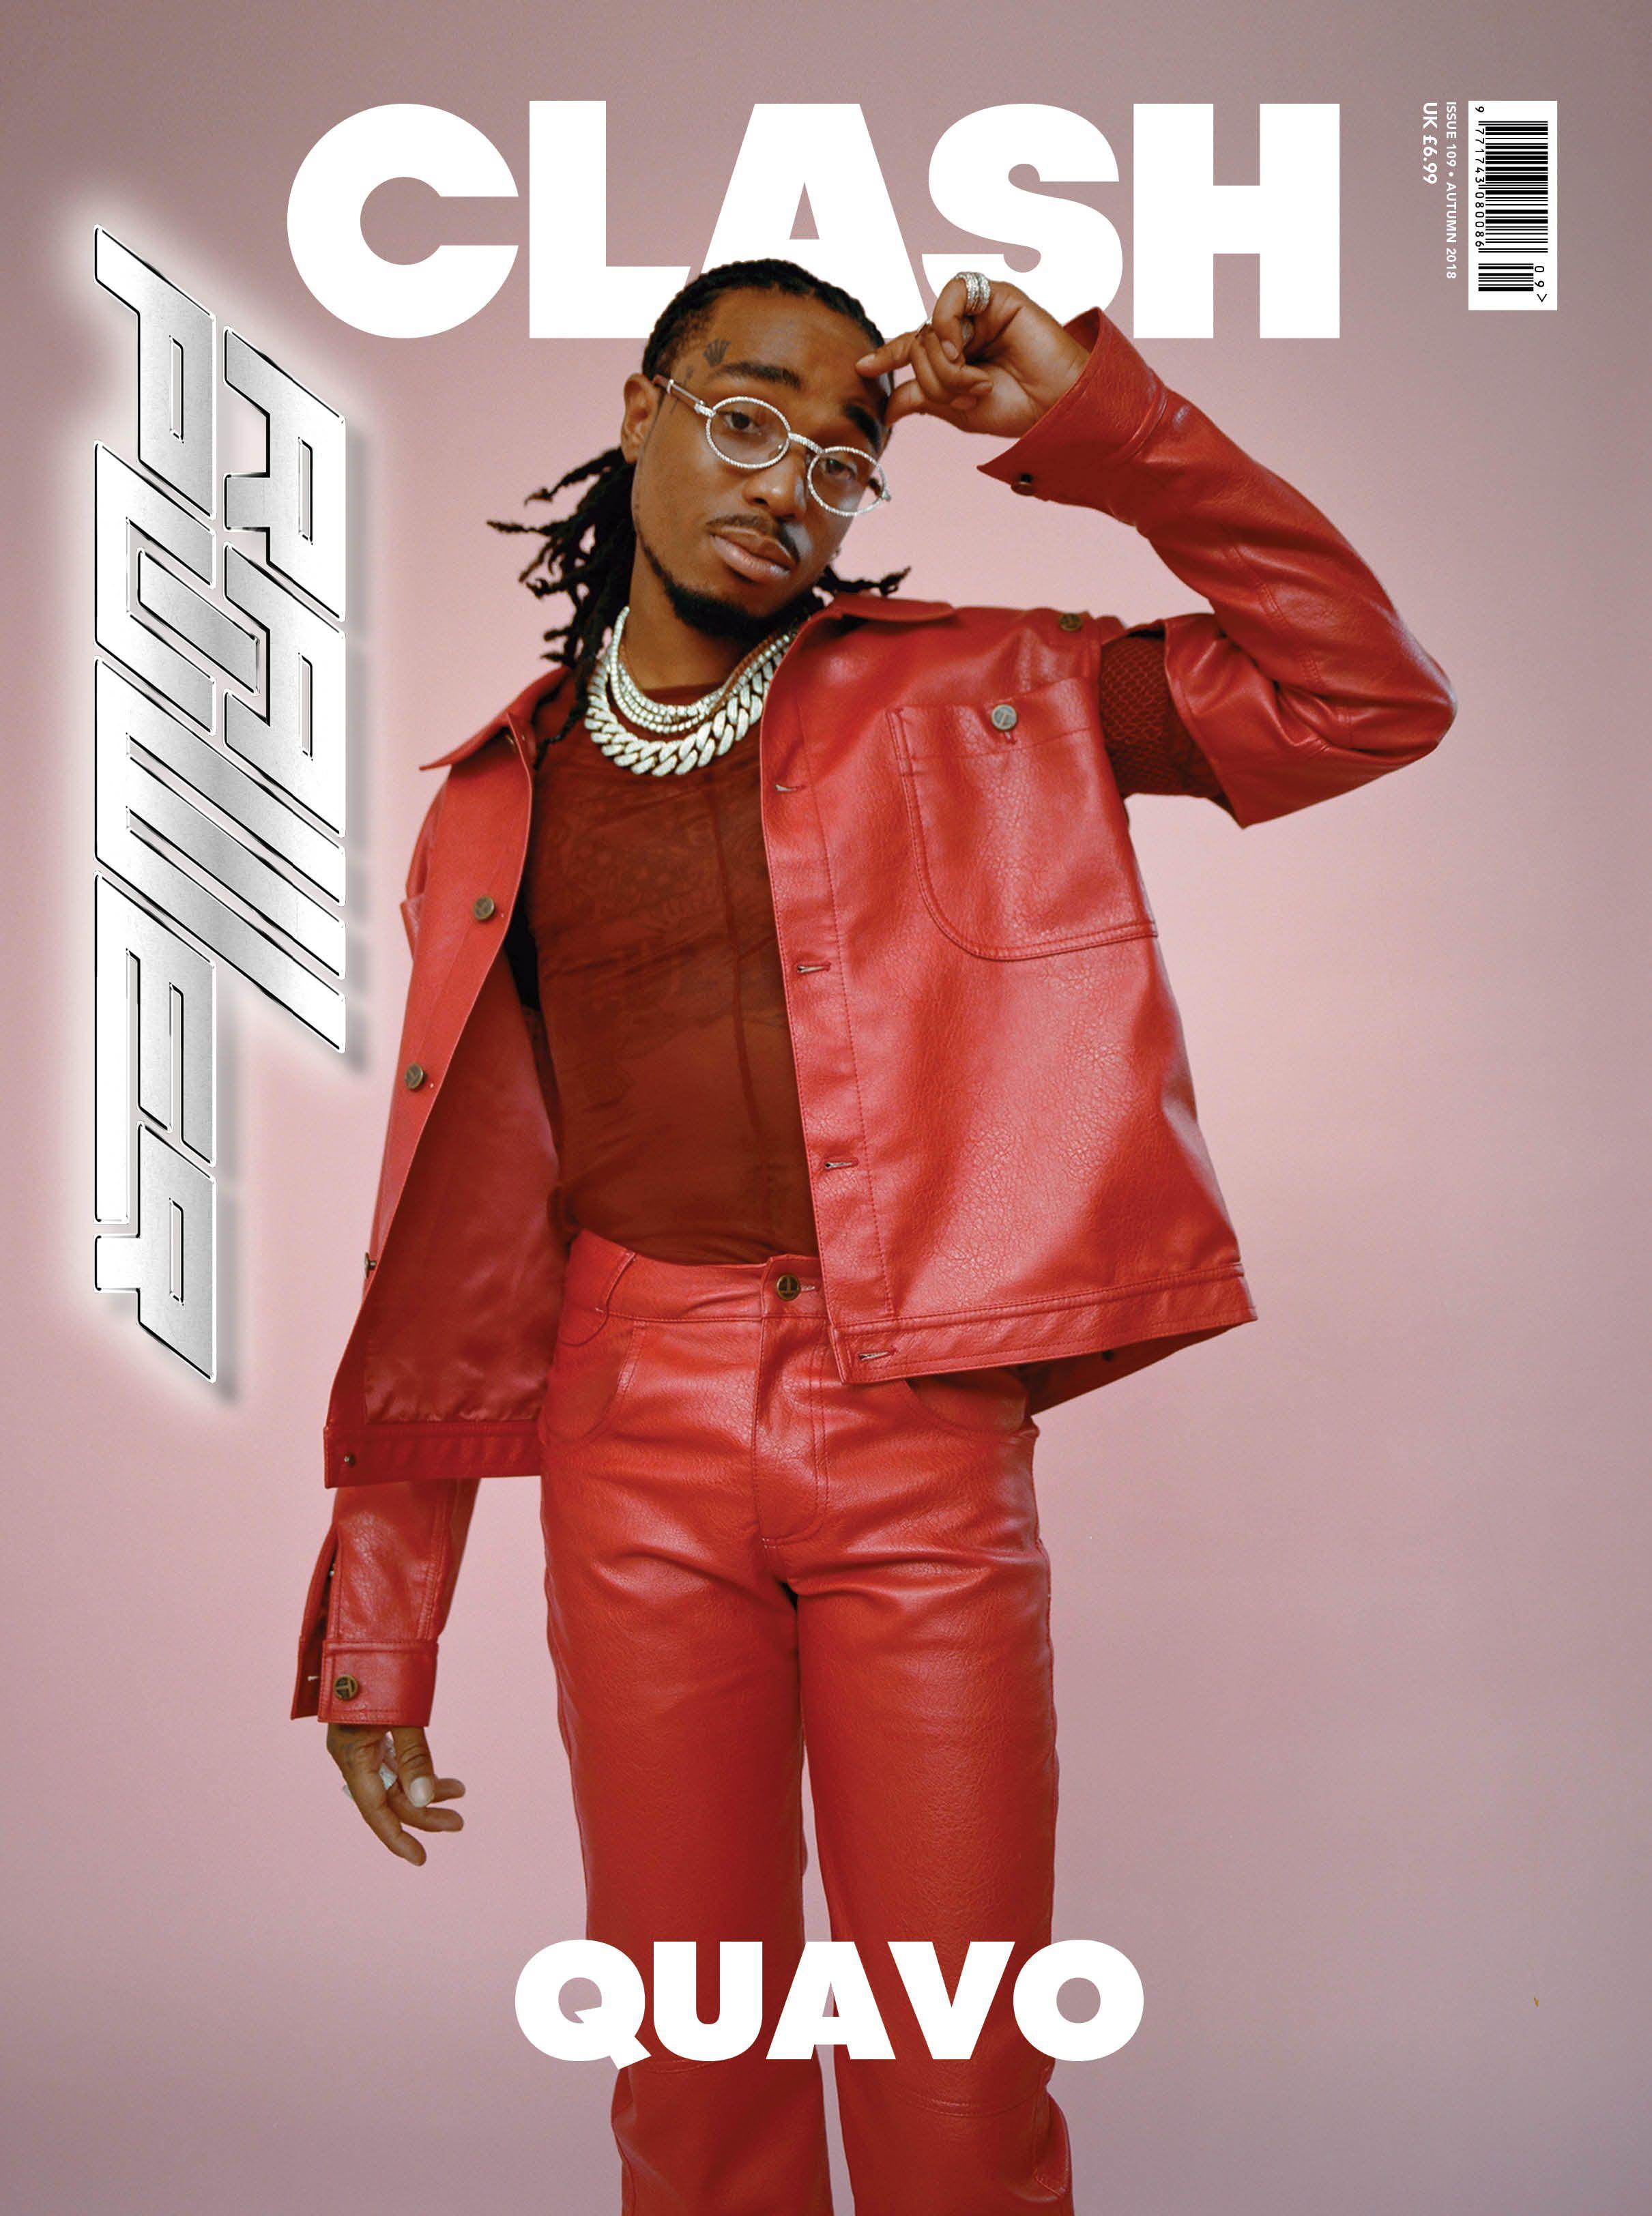 Clash Magazine - Clash 109: Quavo | MIGOS in 2019 | Heart eyes